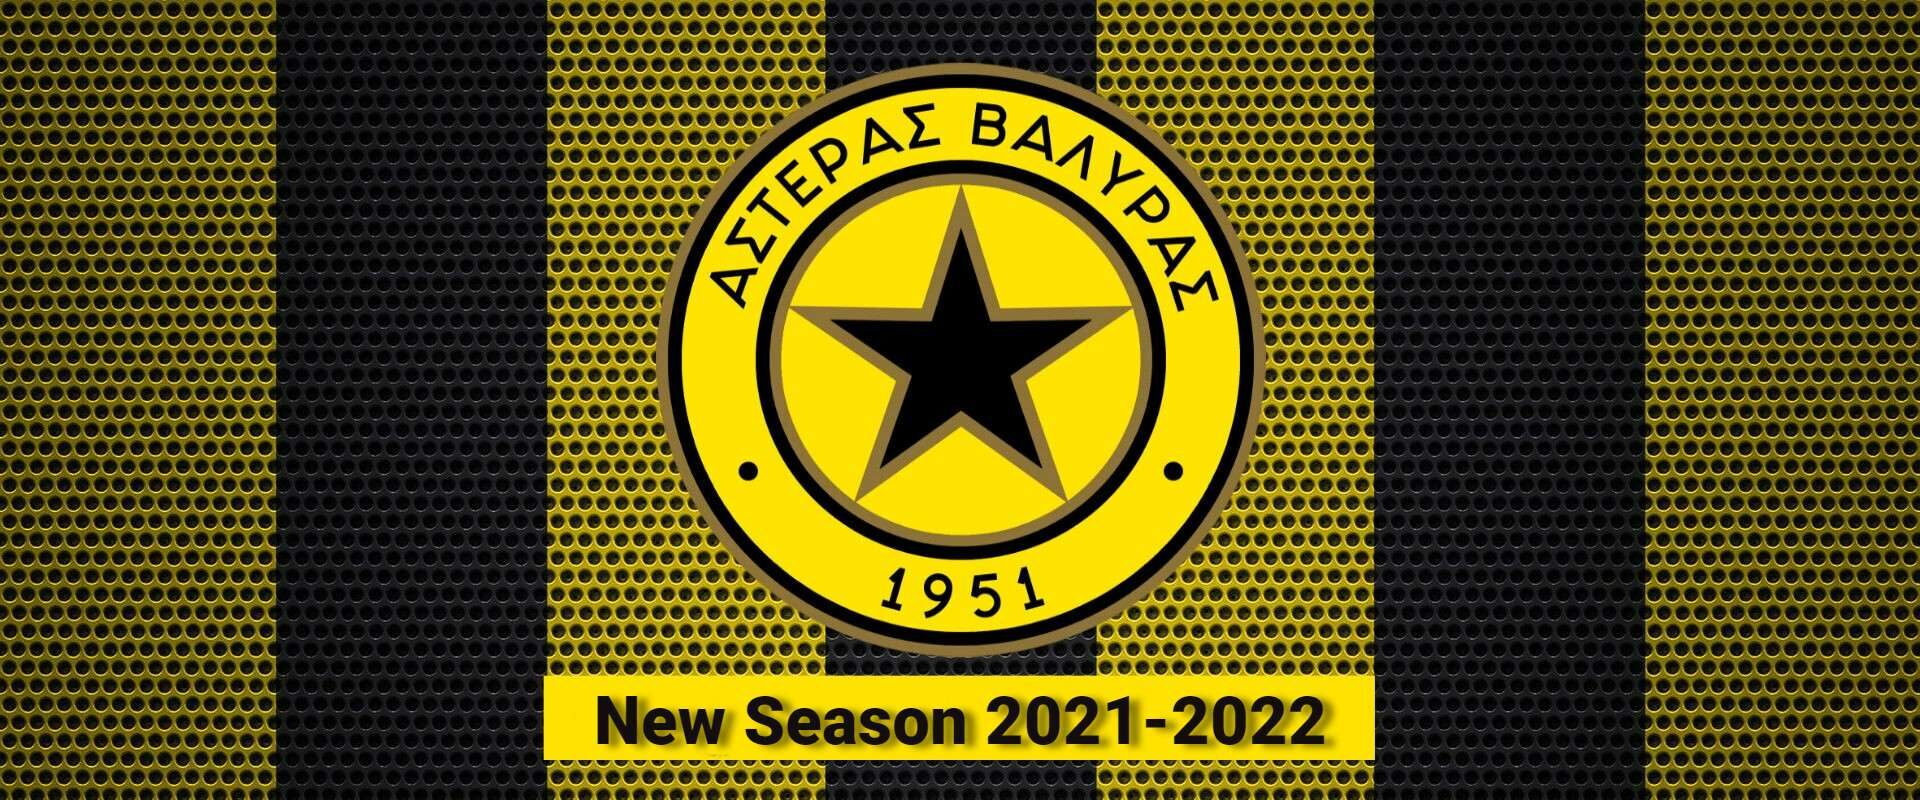 Asteras Valiras F.C Official Web Site